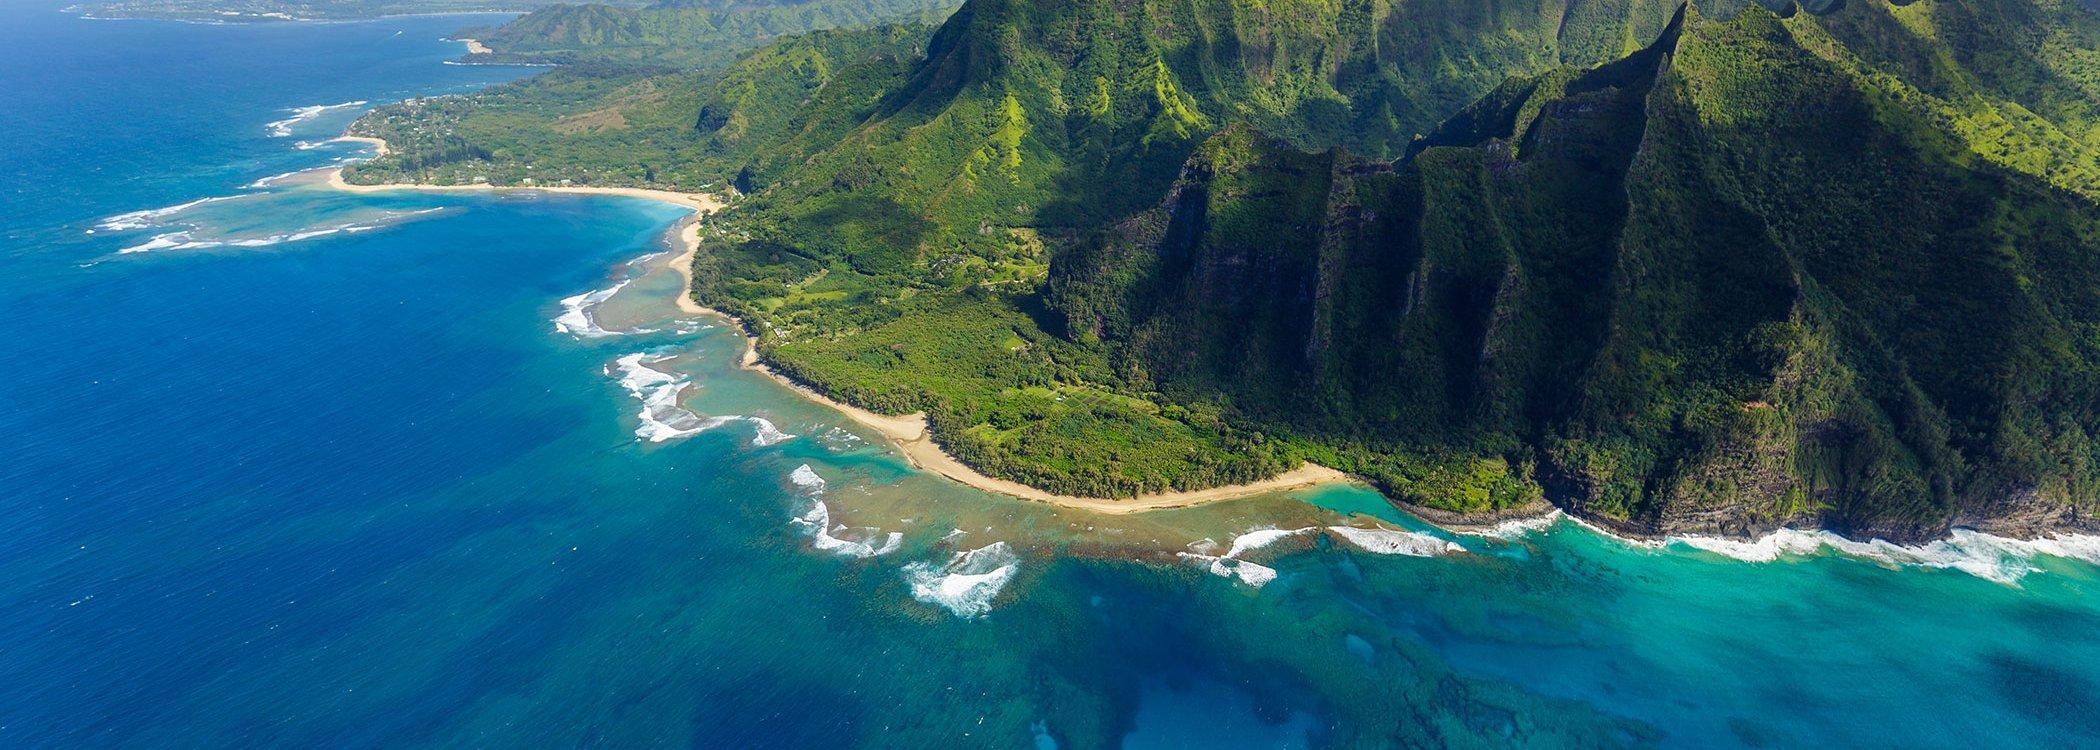 Kauai Must See And Do